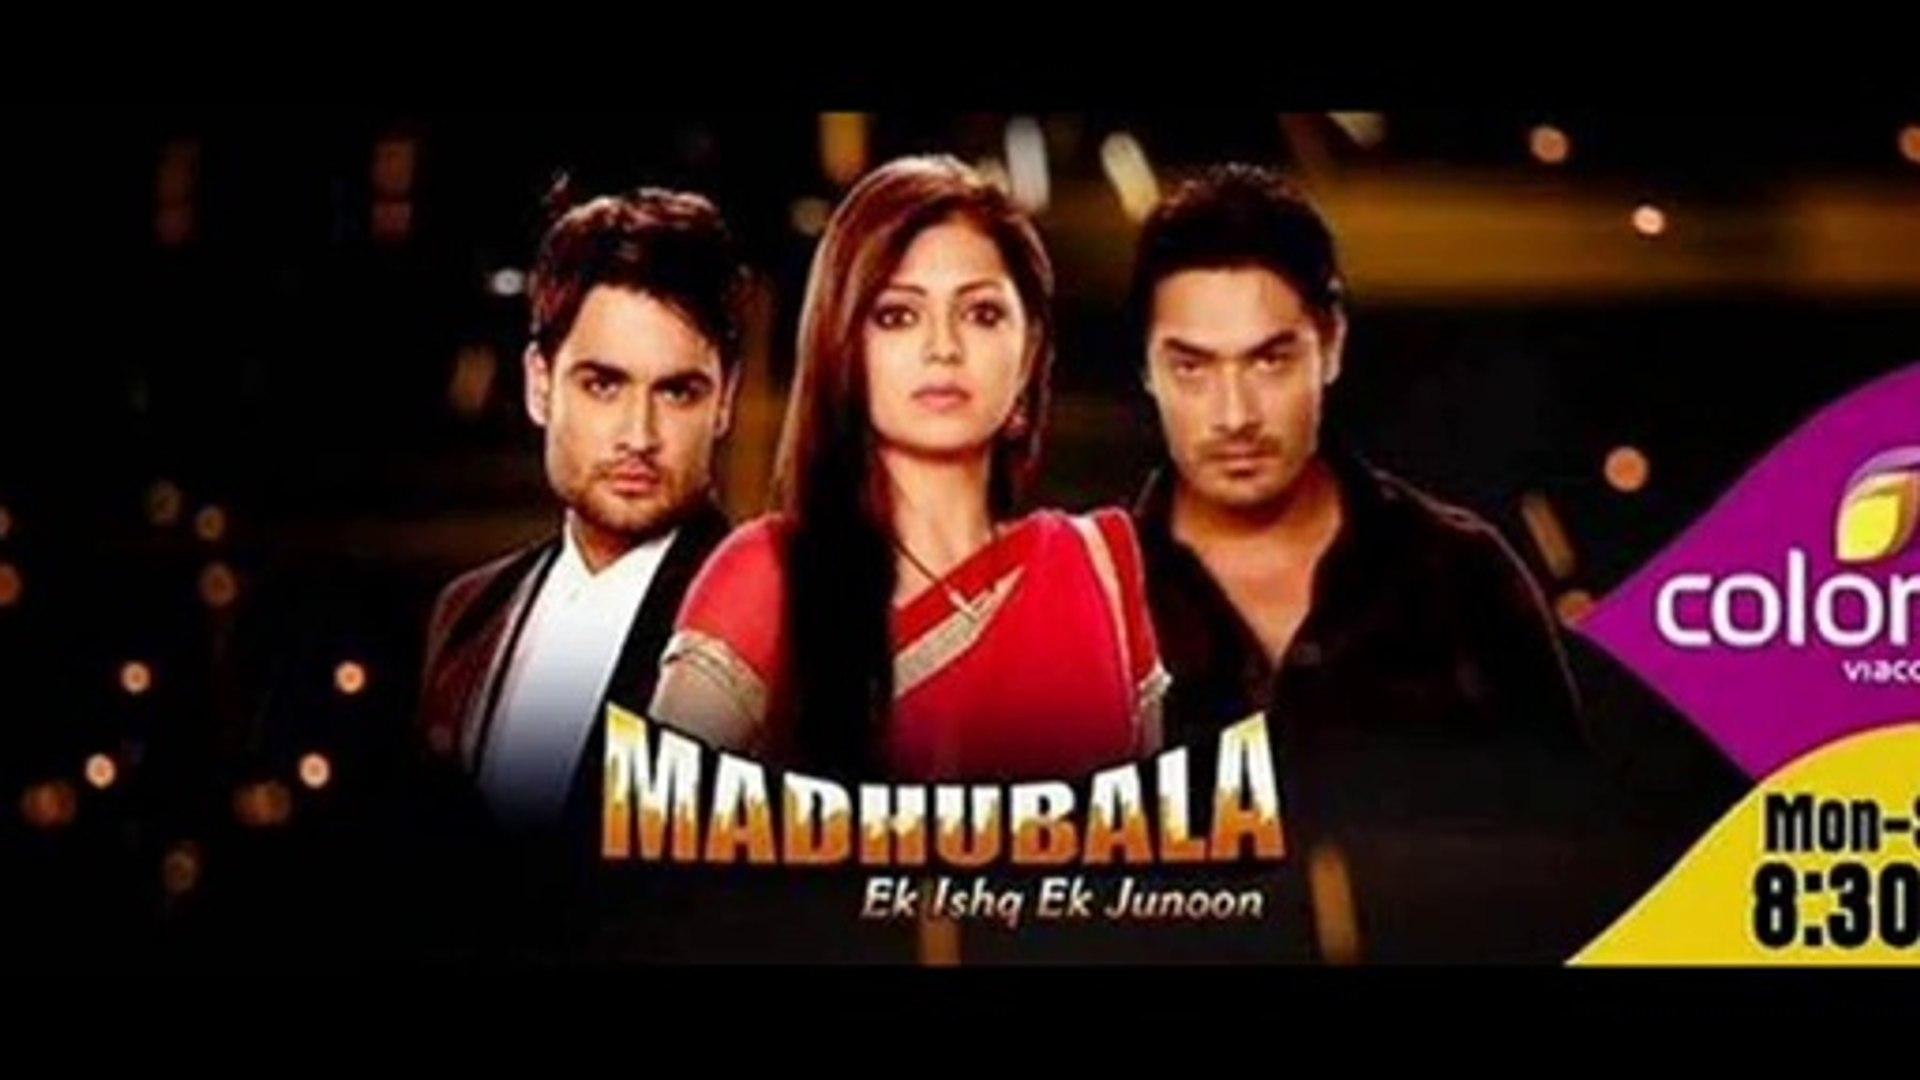 Madhubala - 25th April 2014